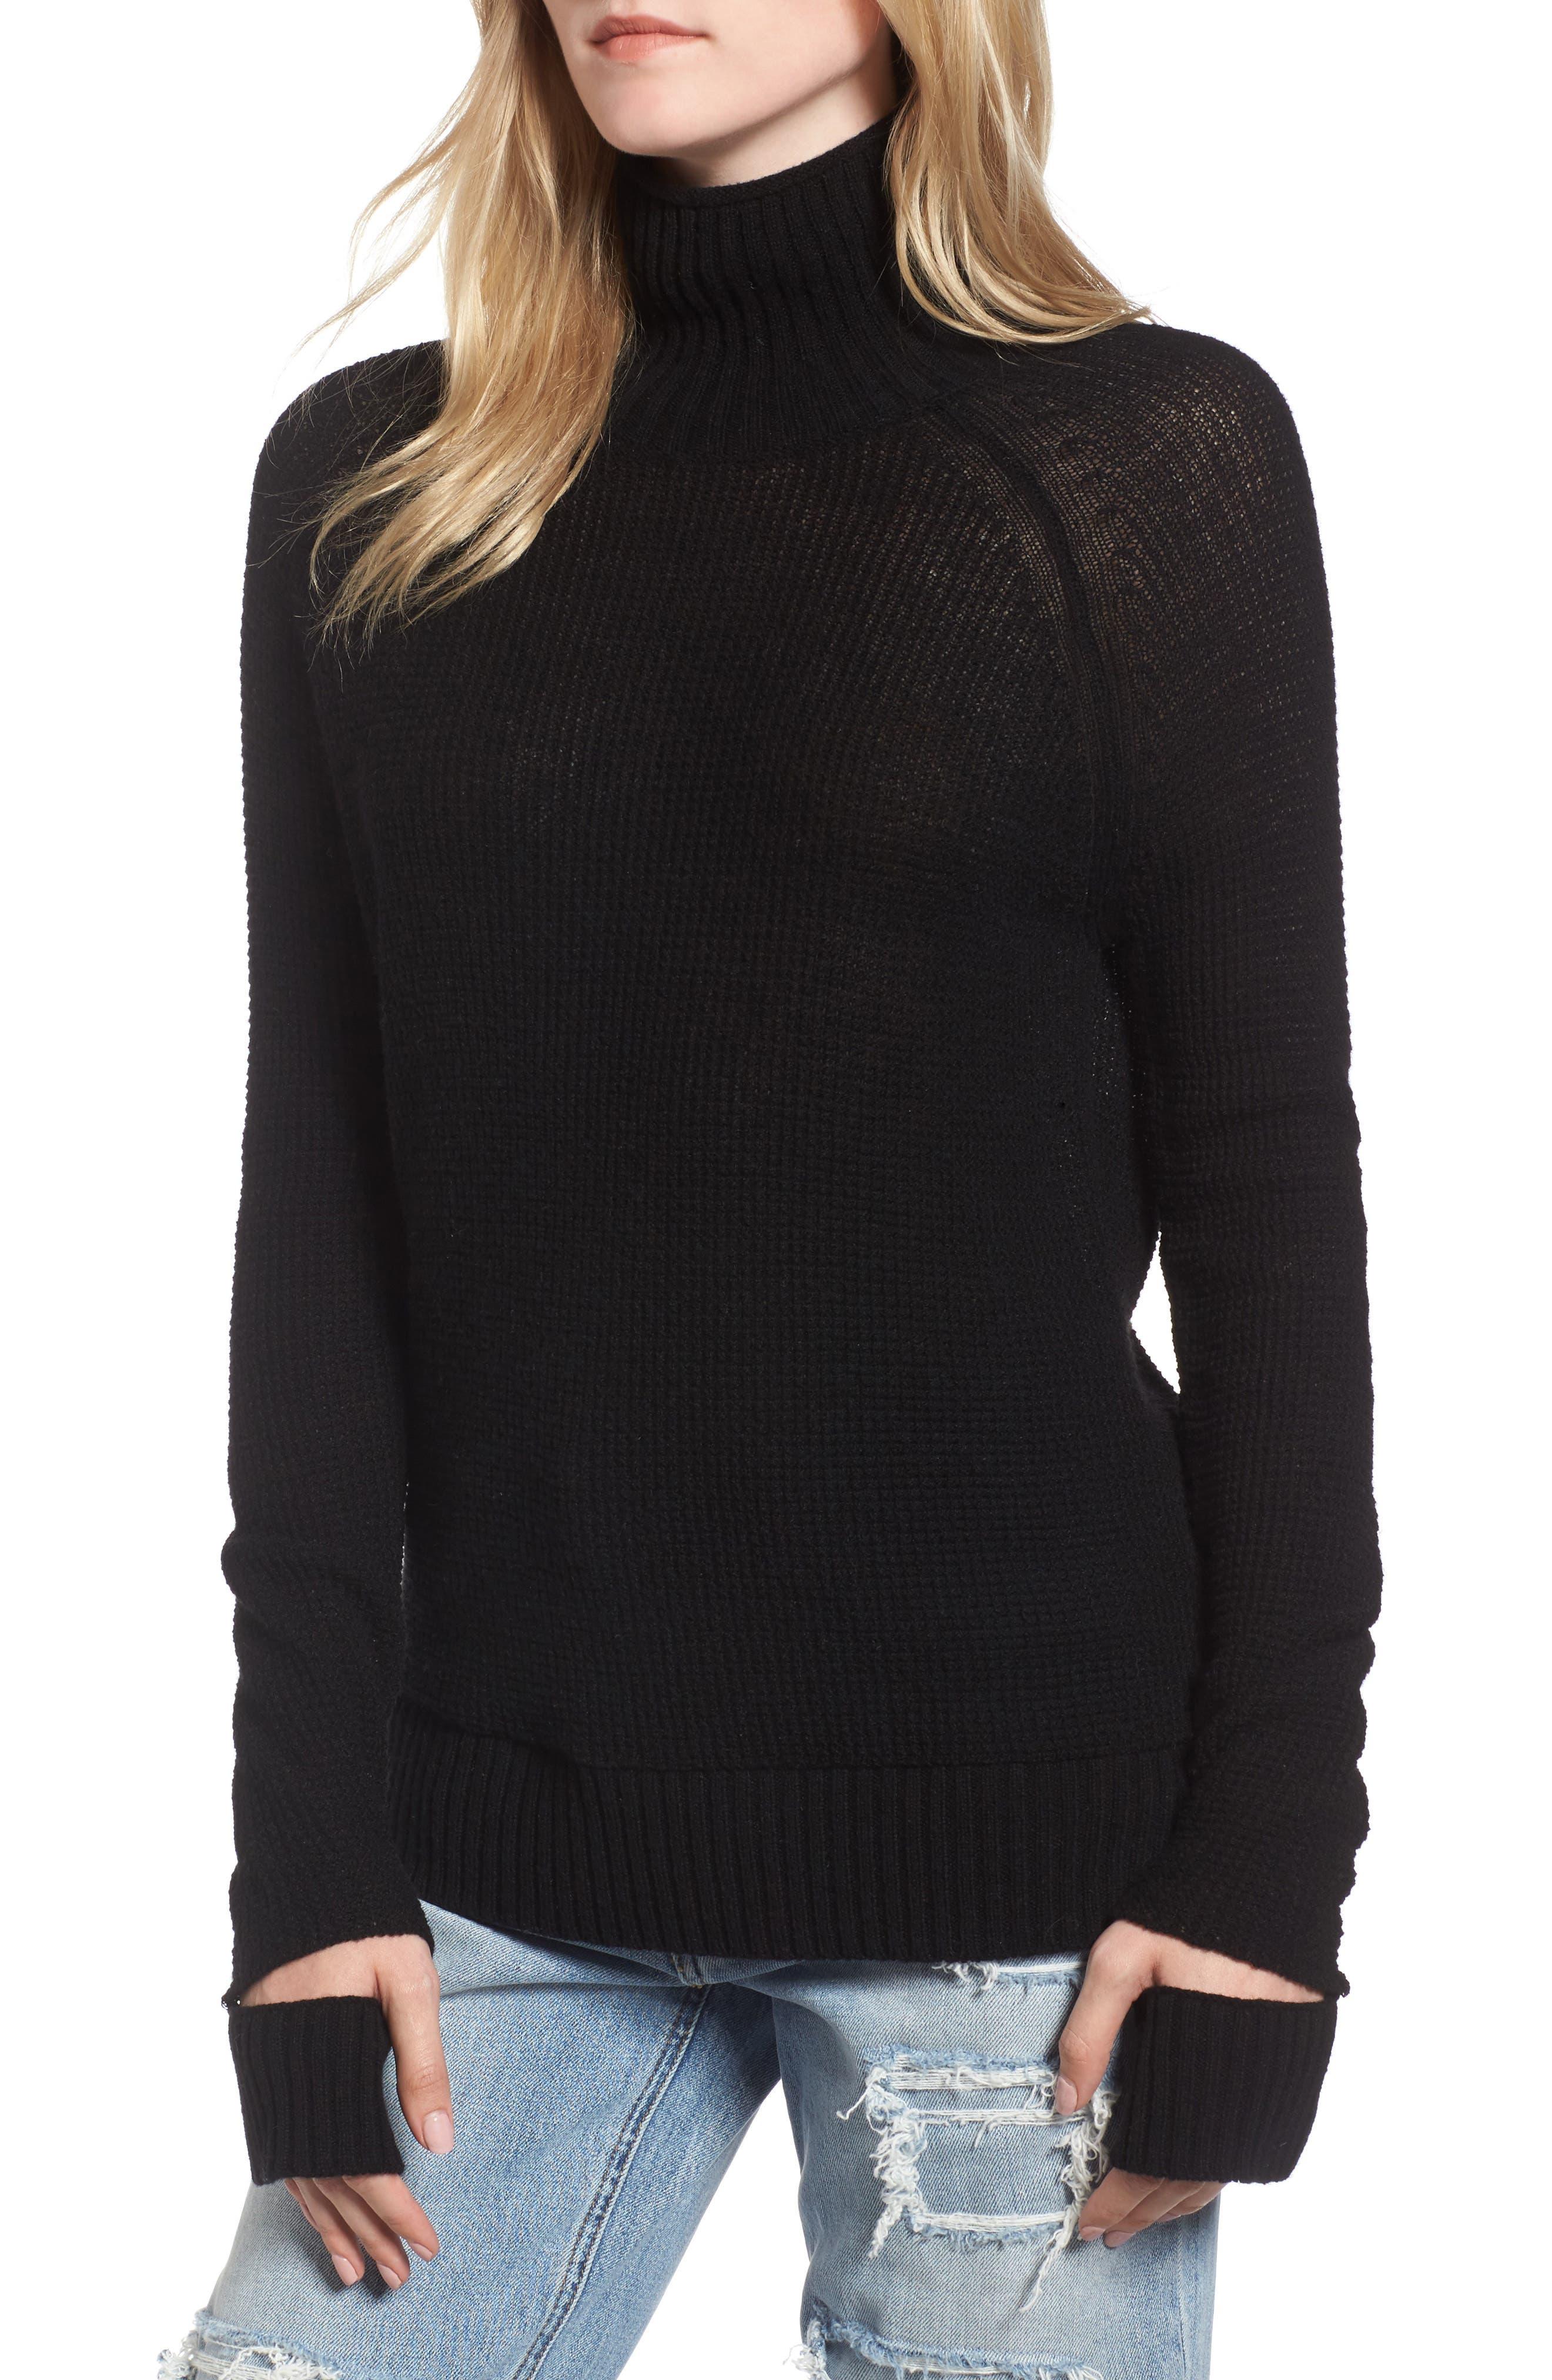 Alternate Image 1 Selected - Joe's Jenni Turtleneck Sweater